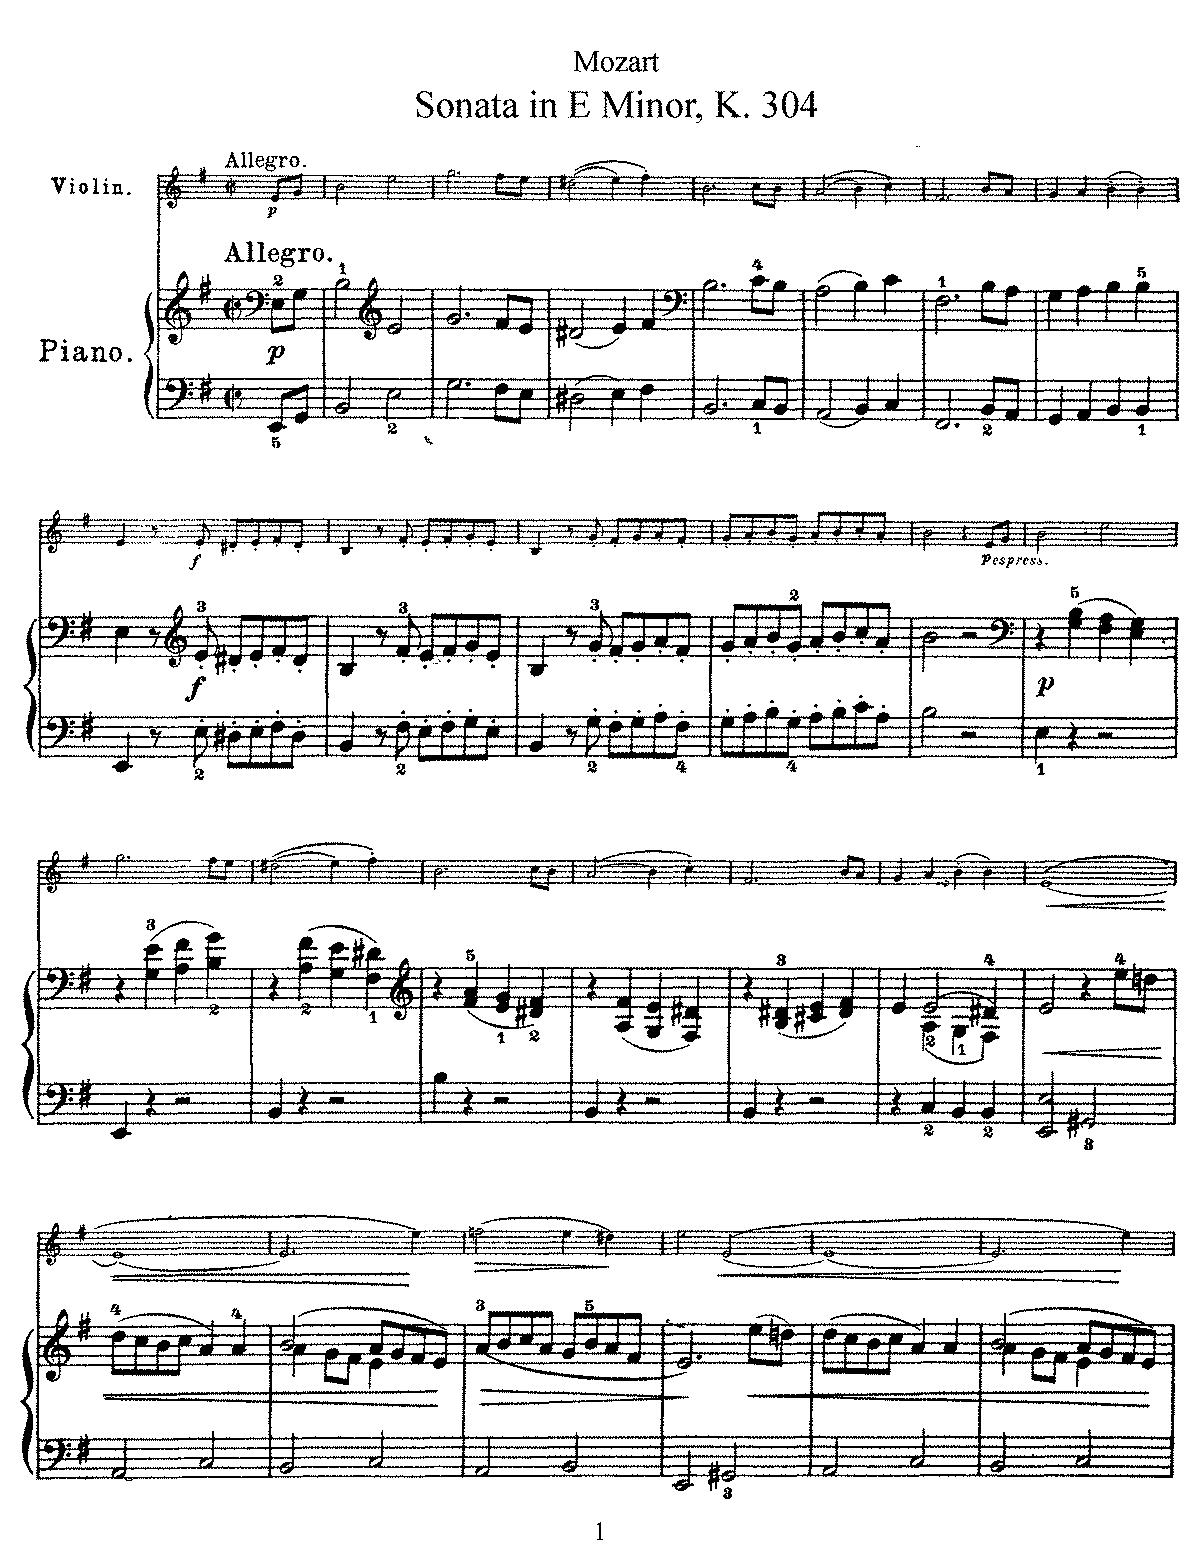 Violin sonata in e minor k304300c mozart wolfgang amadeus sheet music hexwebz Image collections